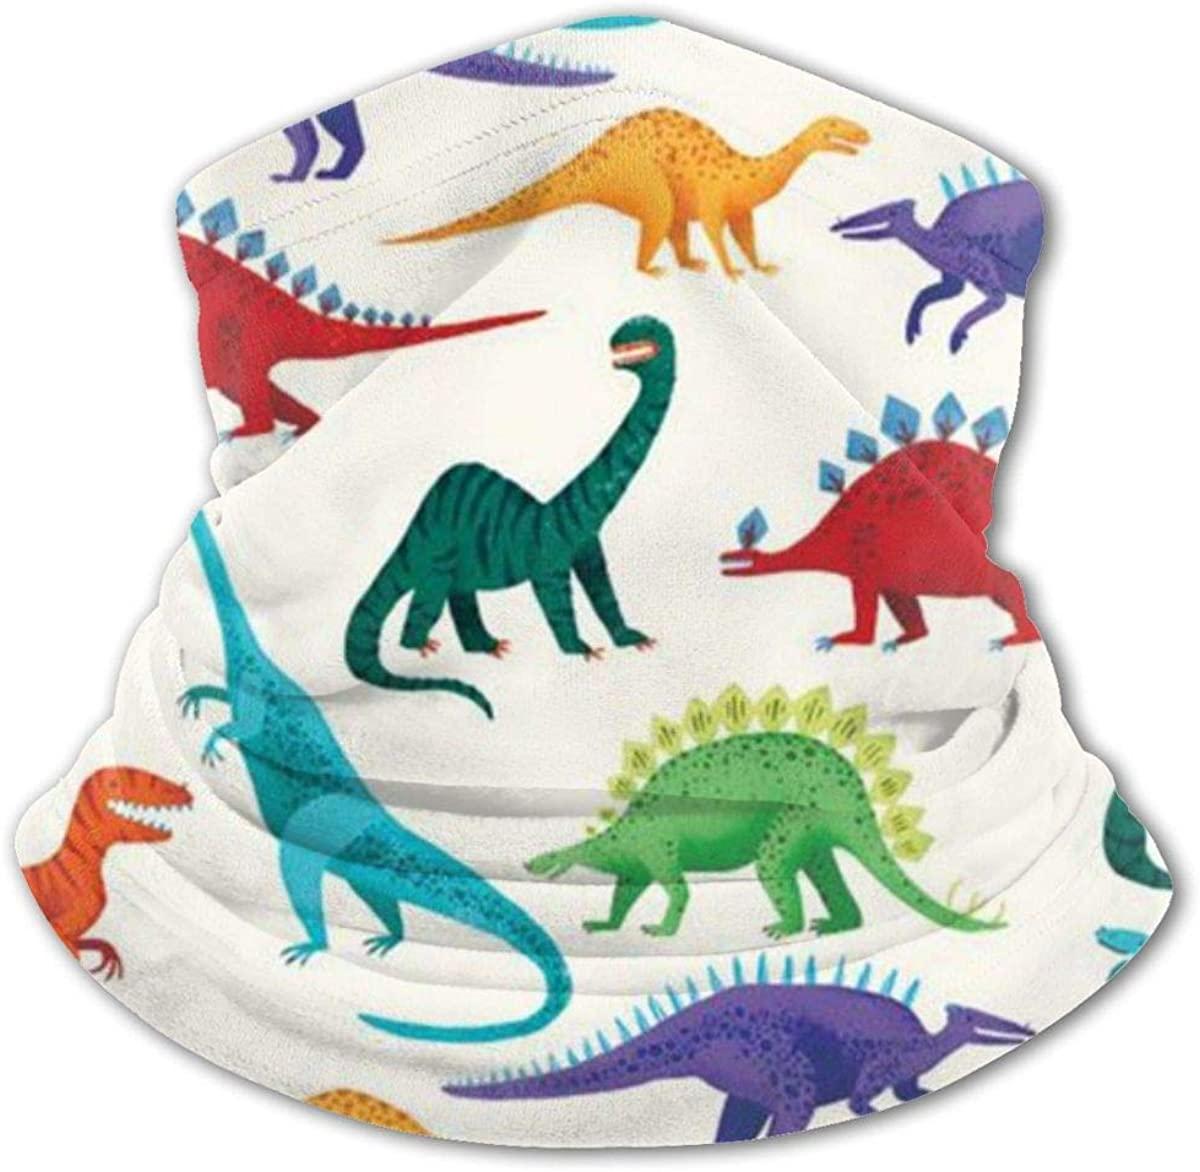 Prehistoric Dinosaur Cartoon Headwear For Girls And Boys, Head Wrap, Neck Gaiter, Headband, Tenn Fishing Mask, Magic Scarf, Tube Mask, Face Bandana Mask For Camping Running Cycling